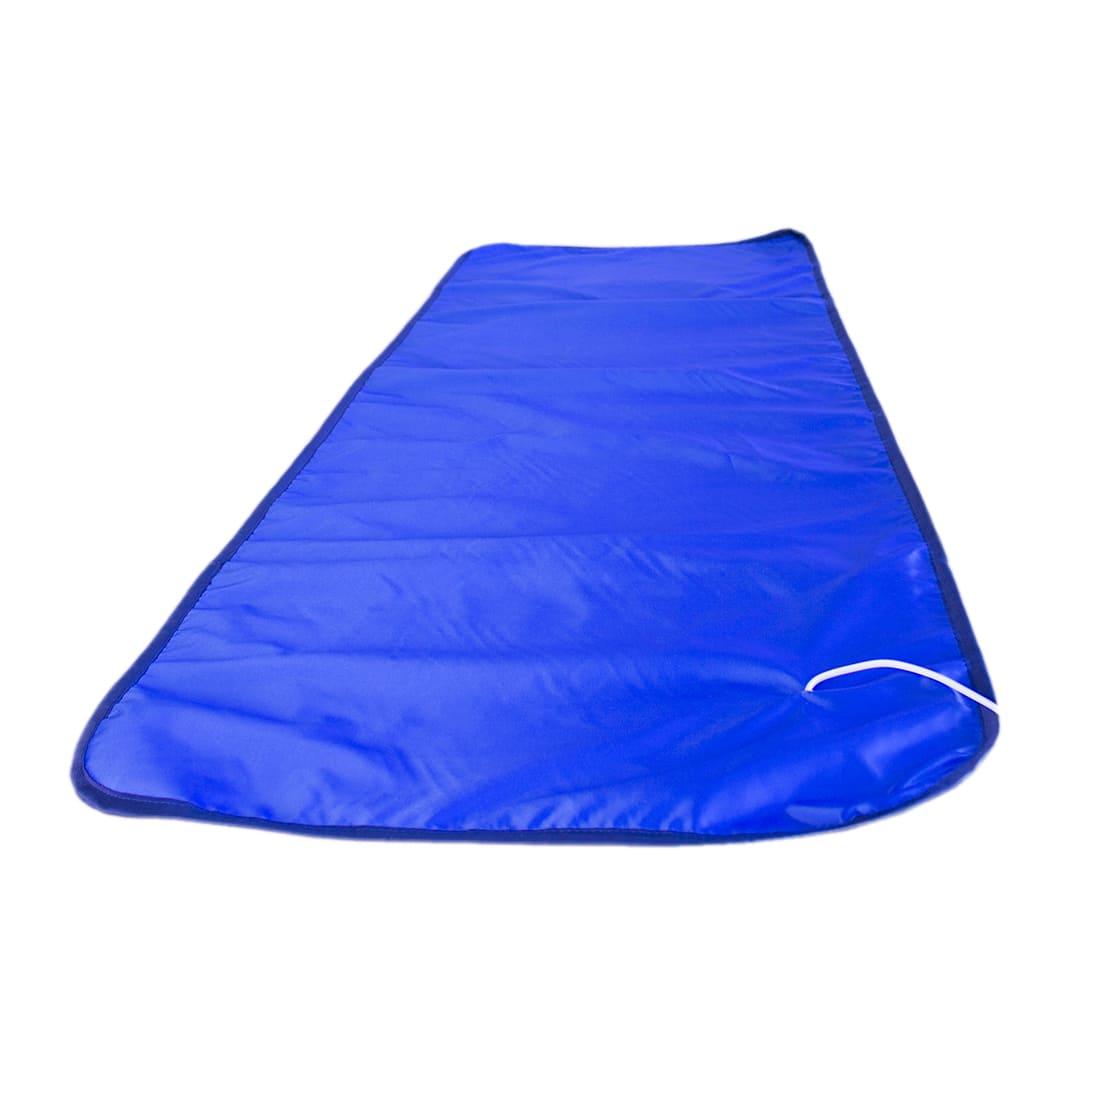 (СП) Hot Cover Накидка на массажную кушетку (60 * 190) см